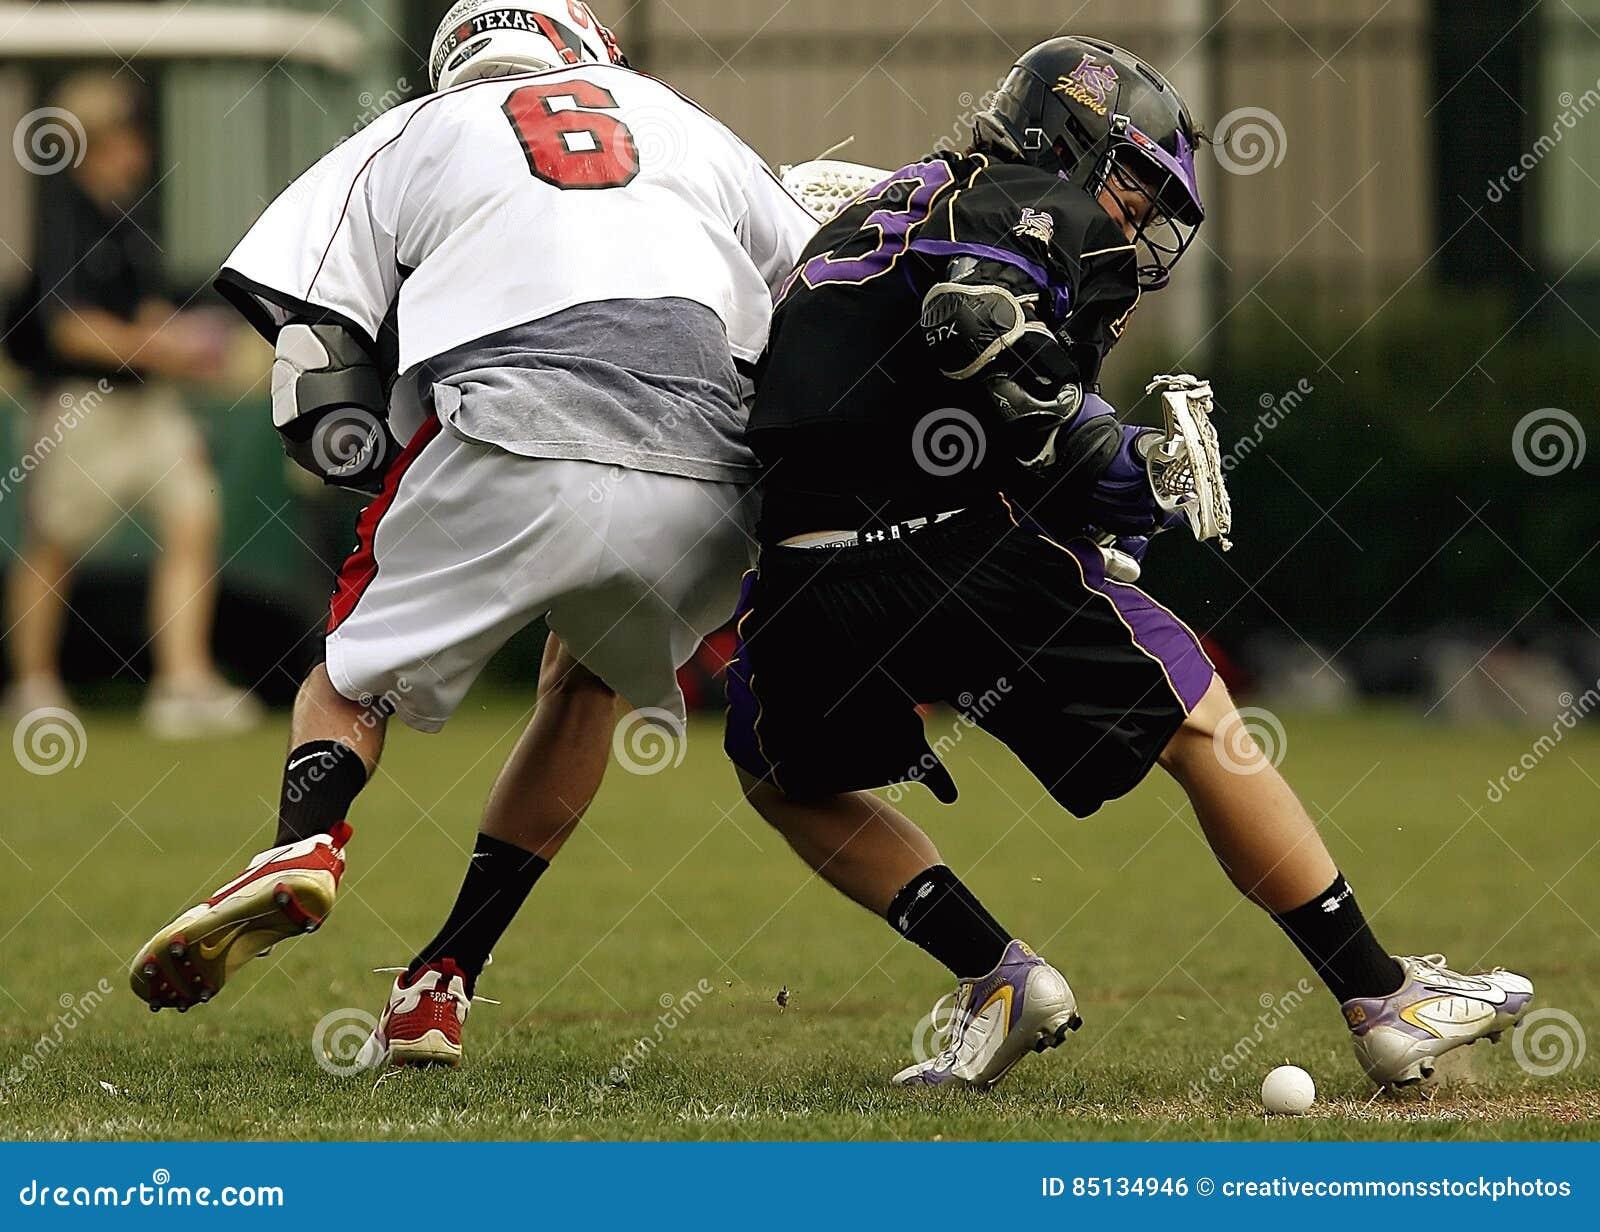 Download 2 Men Playing Football During Daytime Stock Photo - Image of sport, game: 85134946